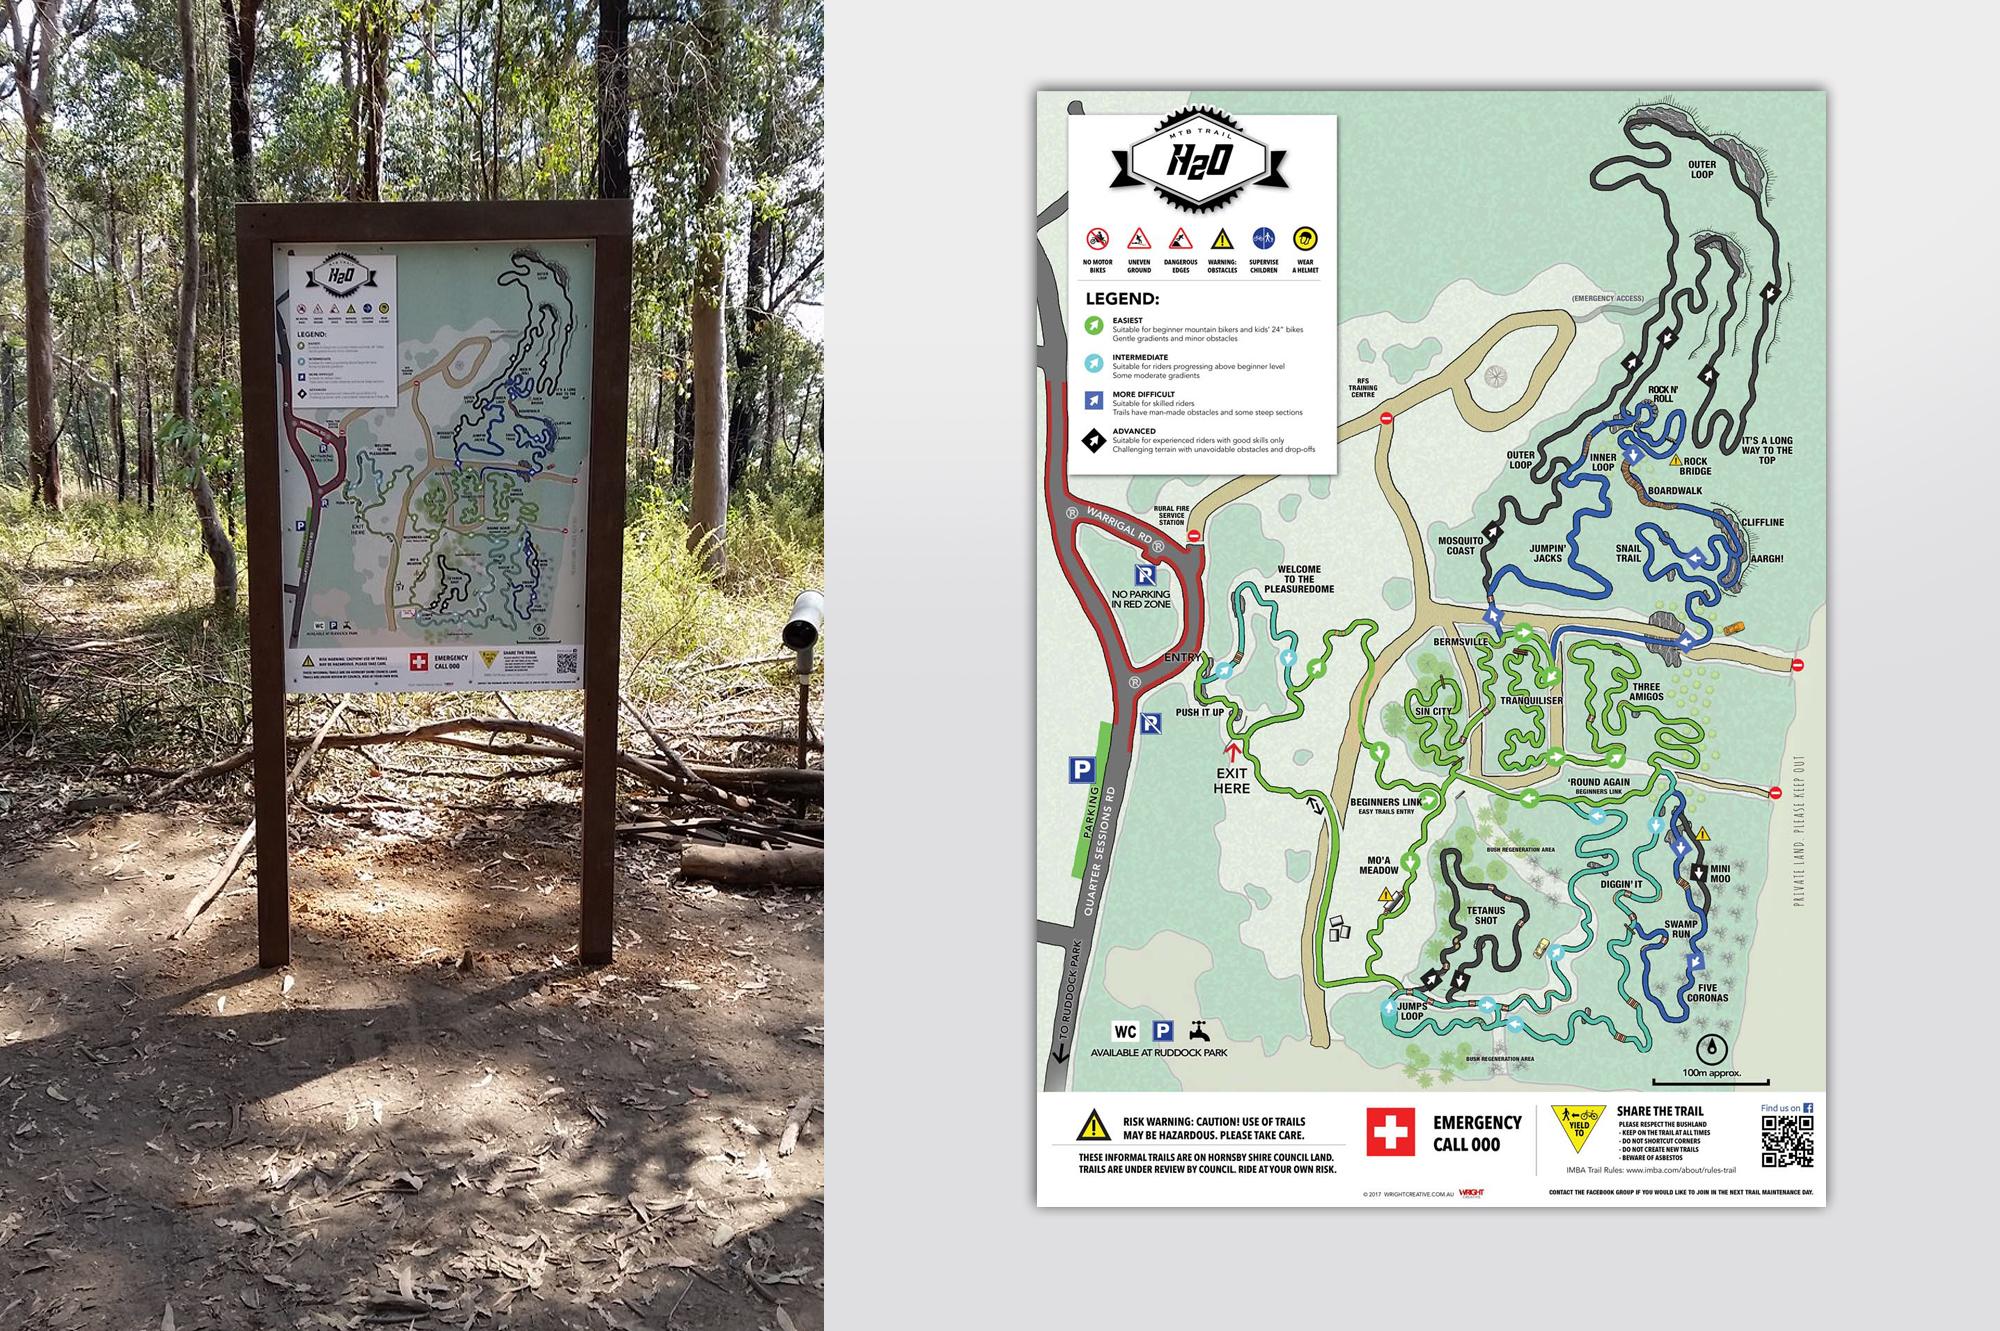 H2o Westleigh Mountain Bike Trails near Hornsby